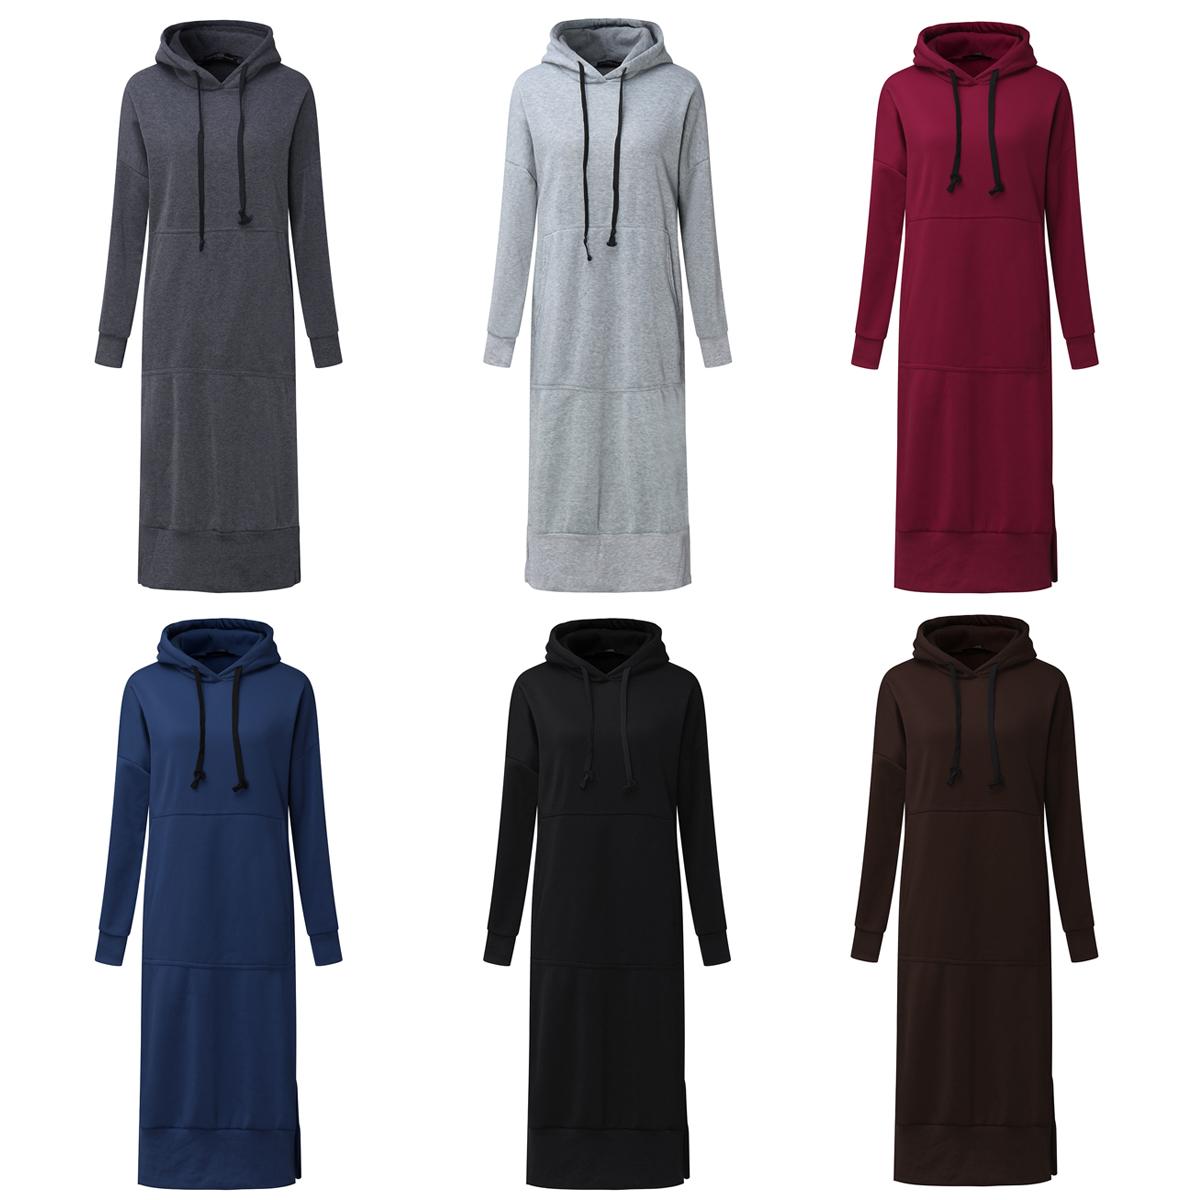 7 Colors Casual Women Solid Color Long Sleeve Pocket Hooded Sweatshirt Dress